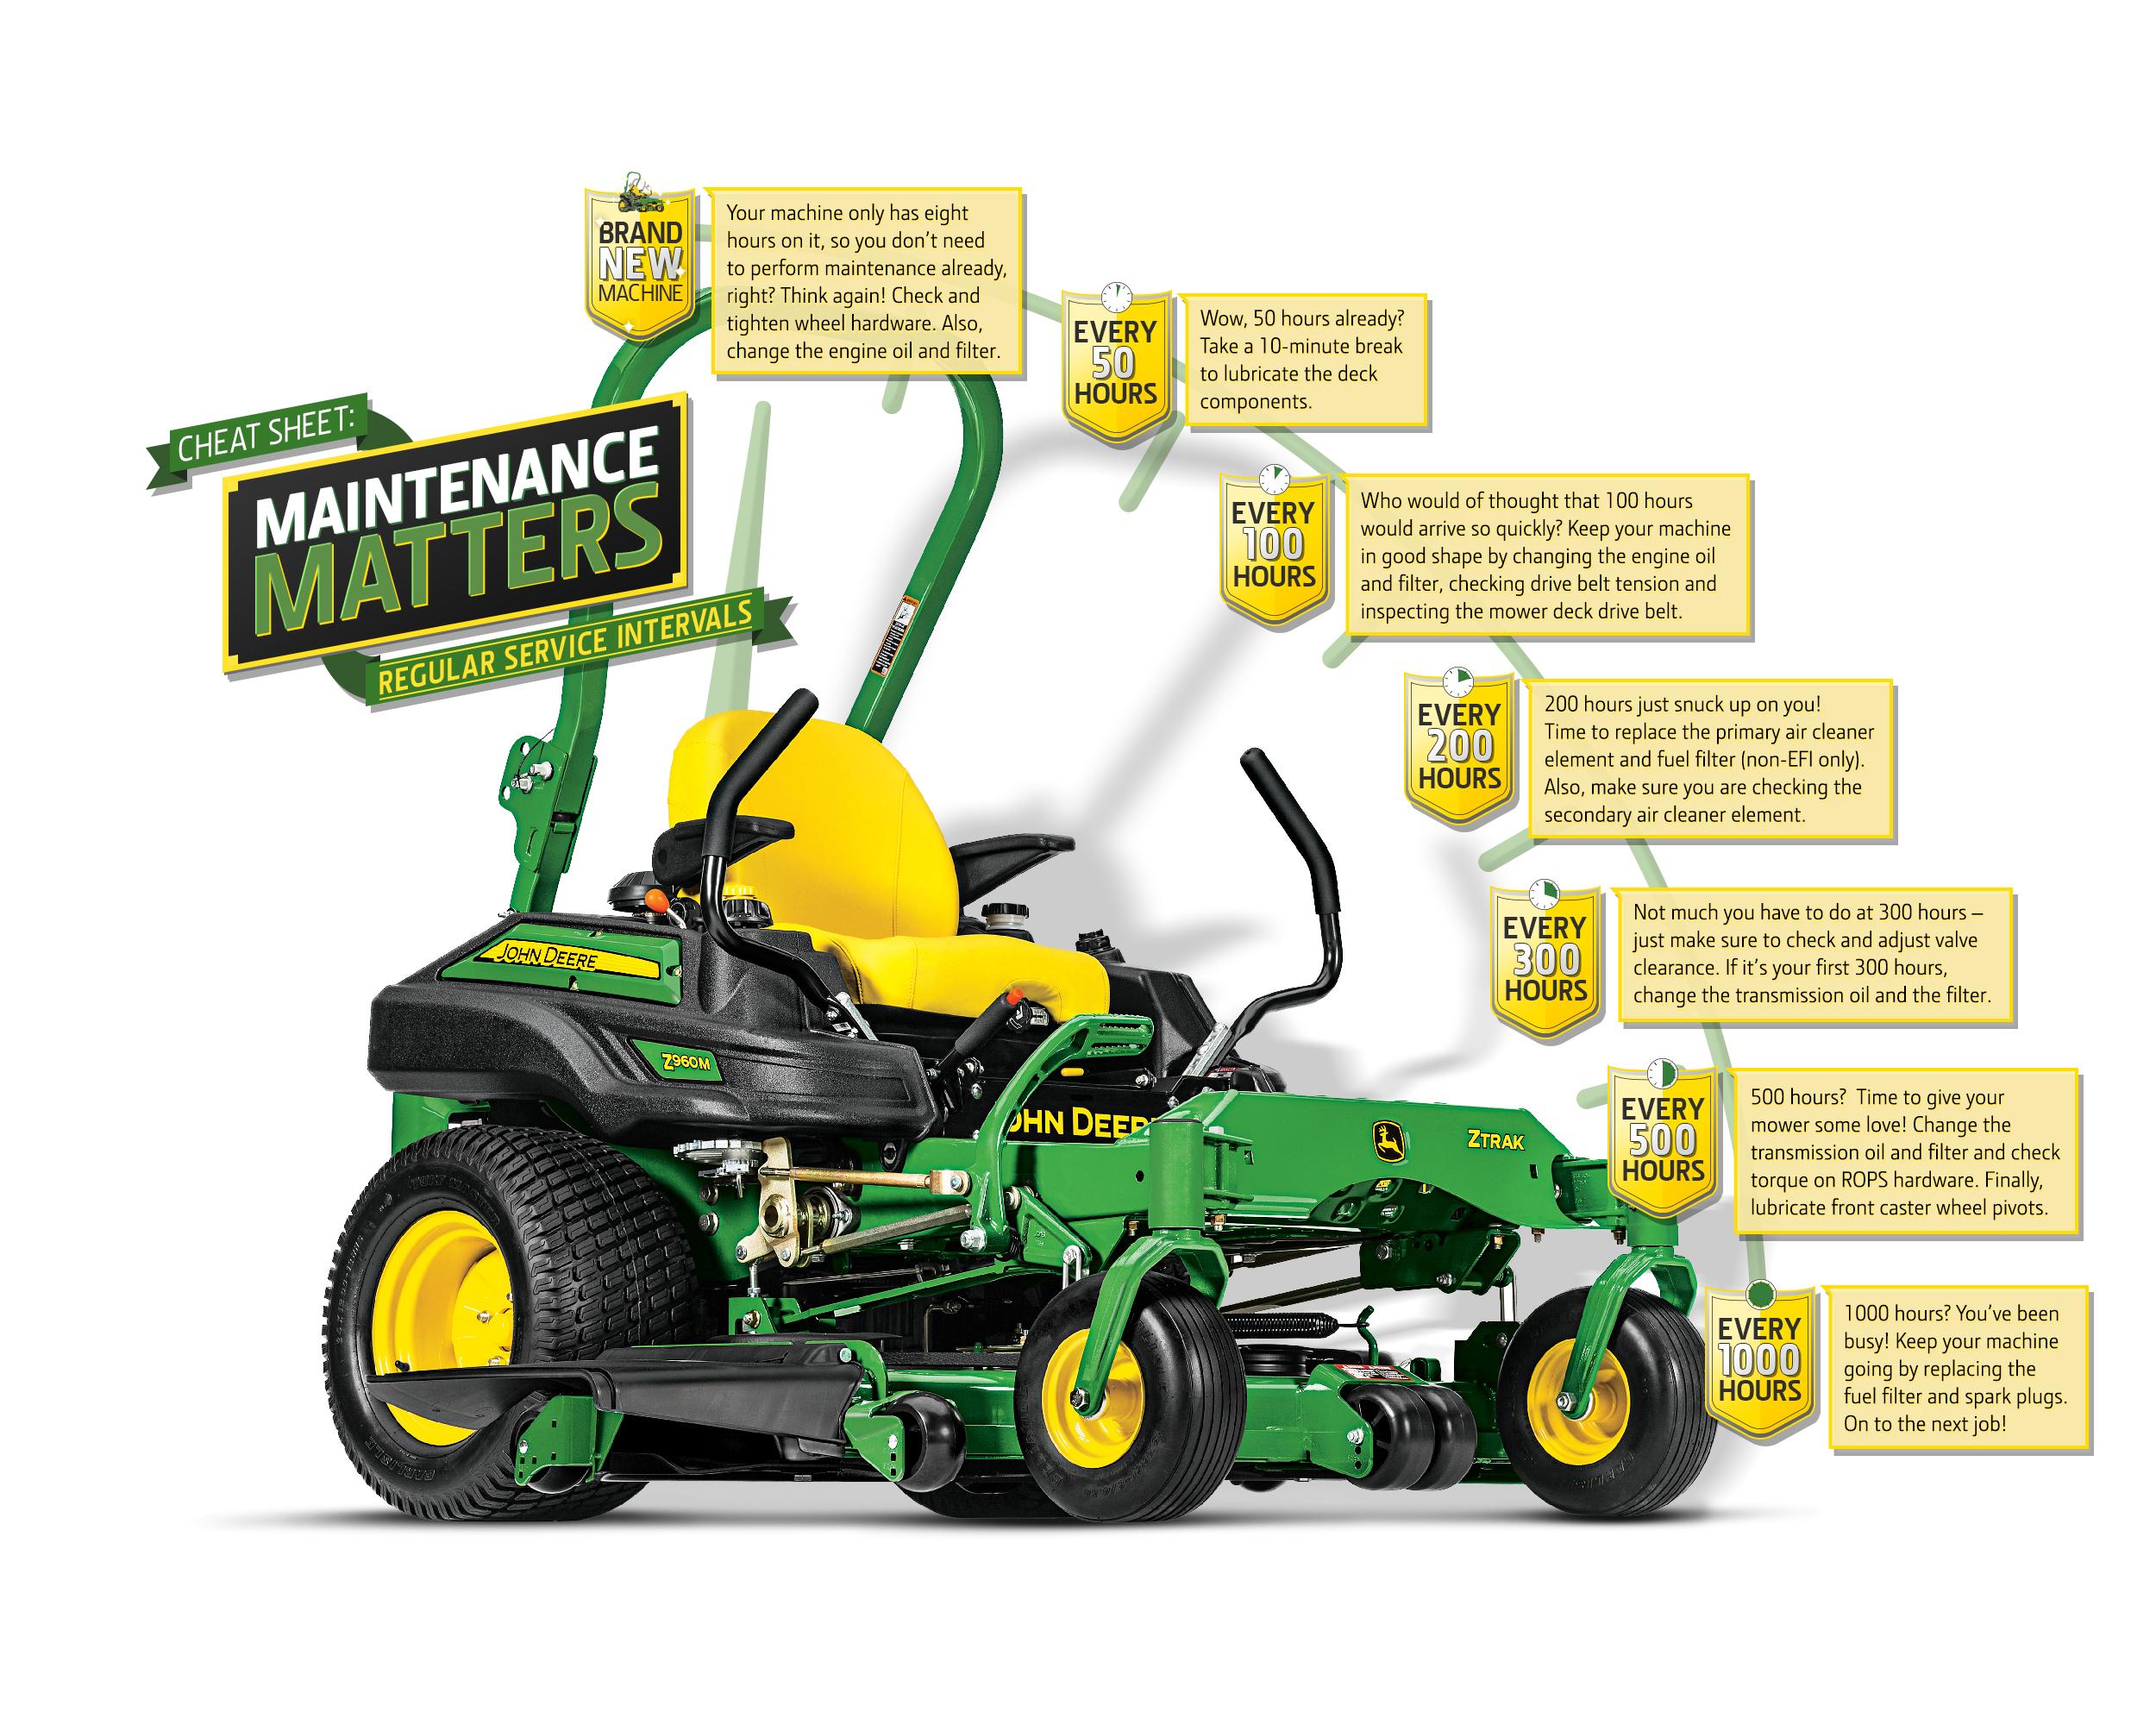 john deere shares mower service tips landscape managementjd_maintenancematters_cheatsheet